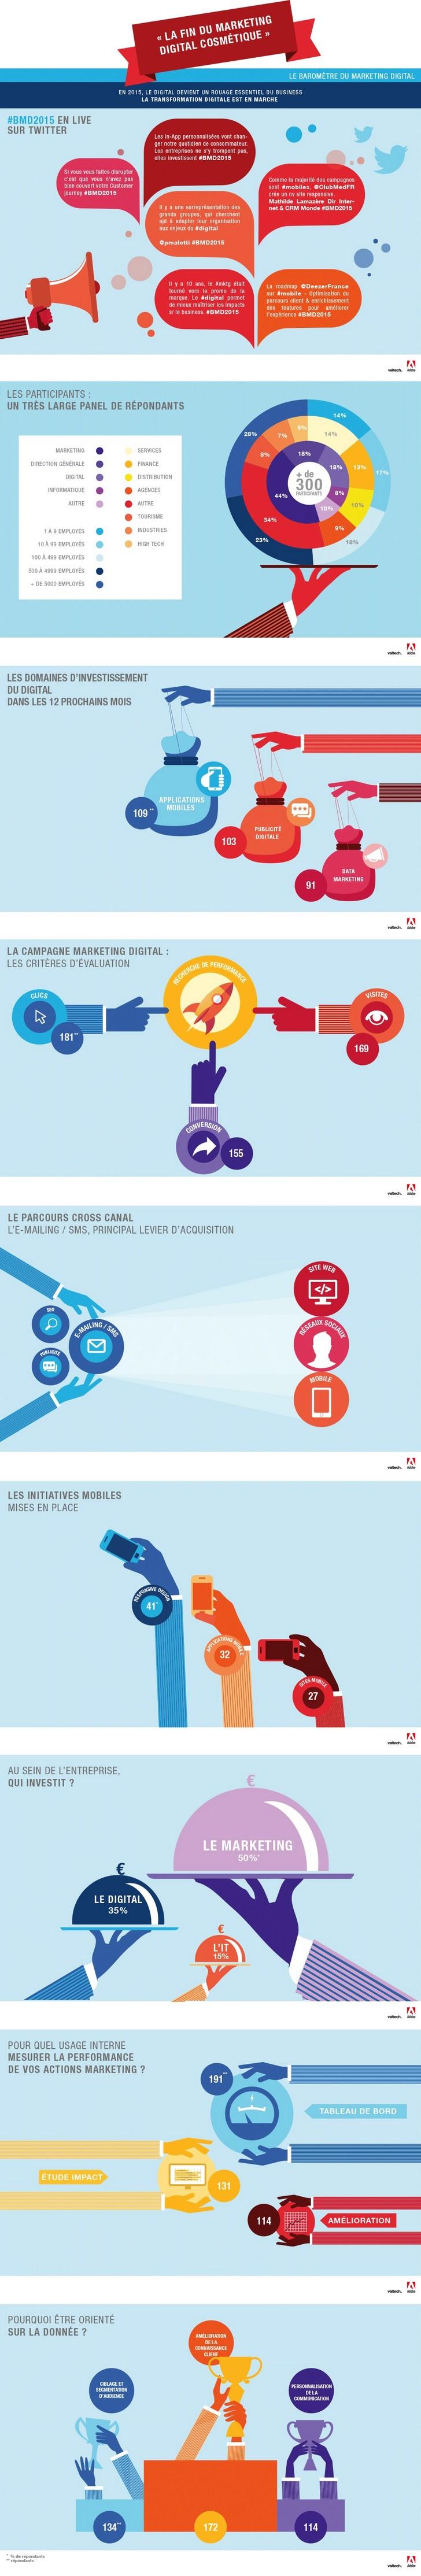 infographie_tendances_digitales_adobe-valtech